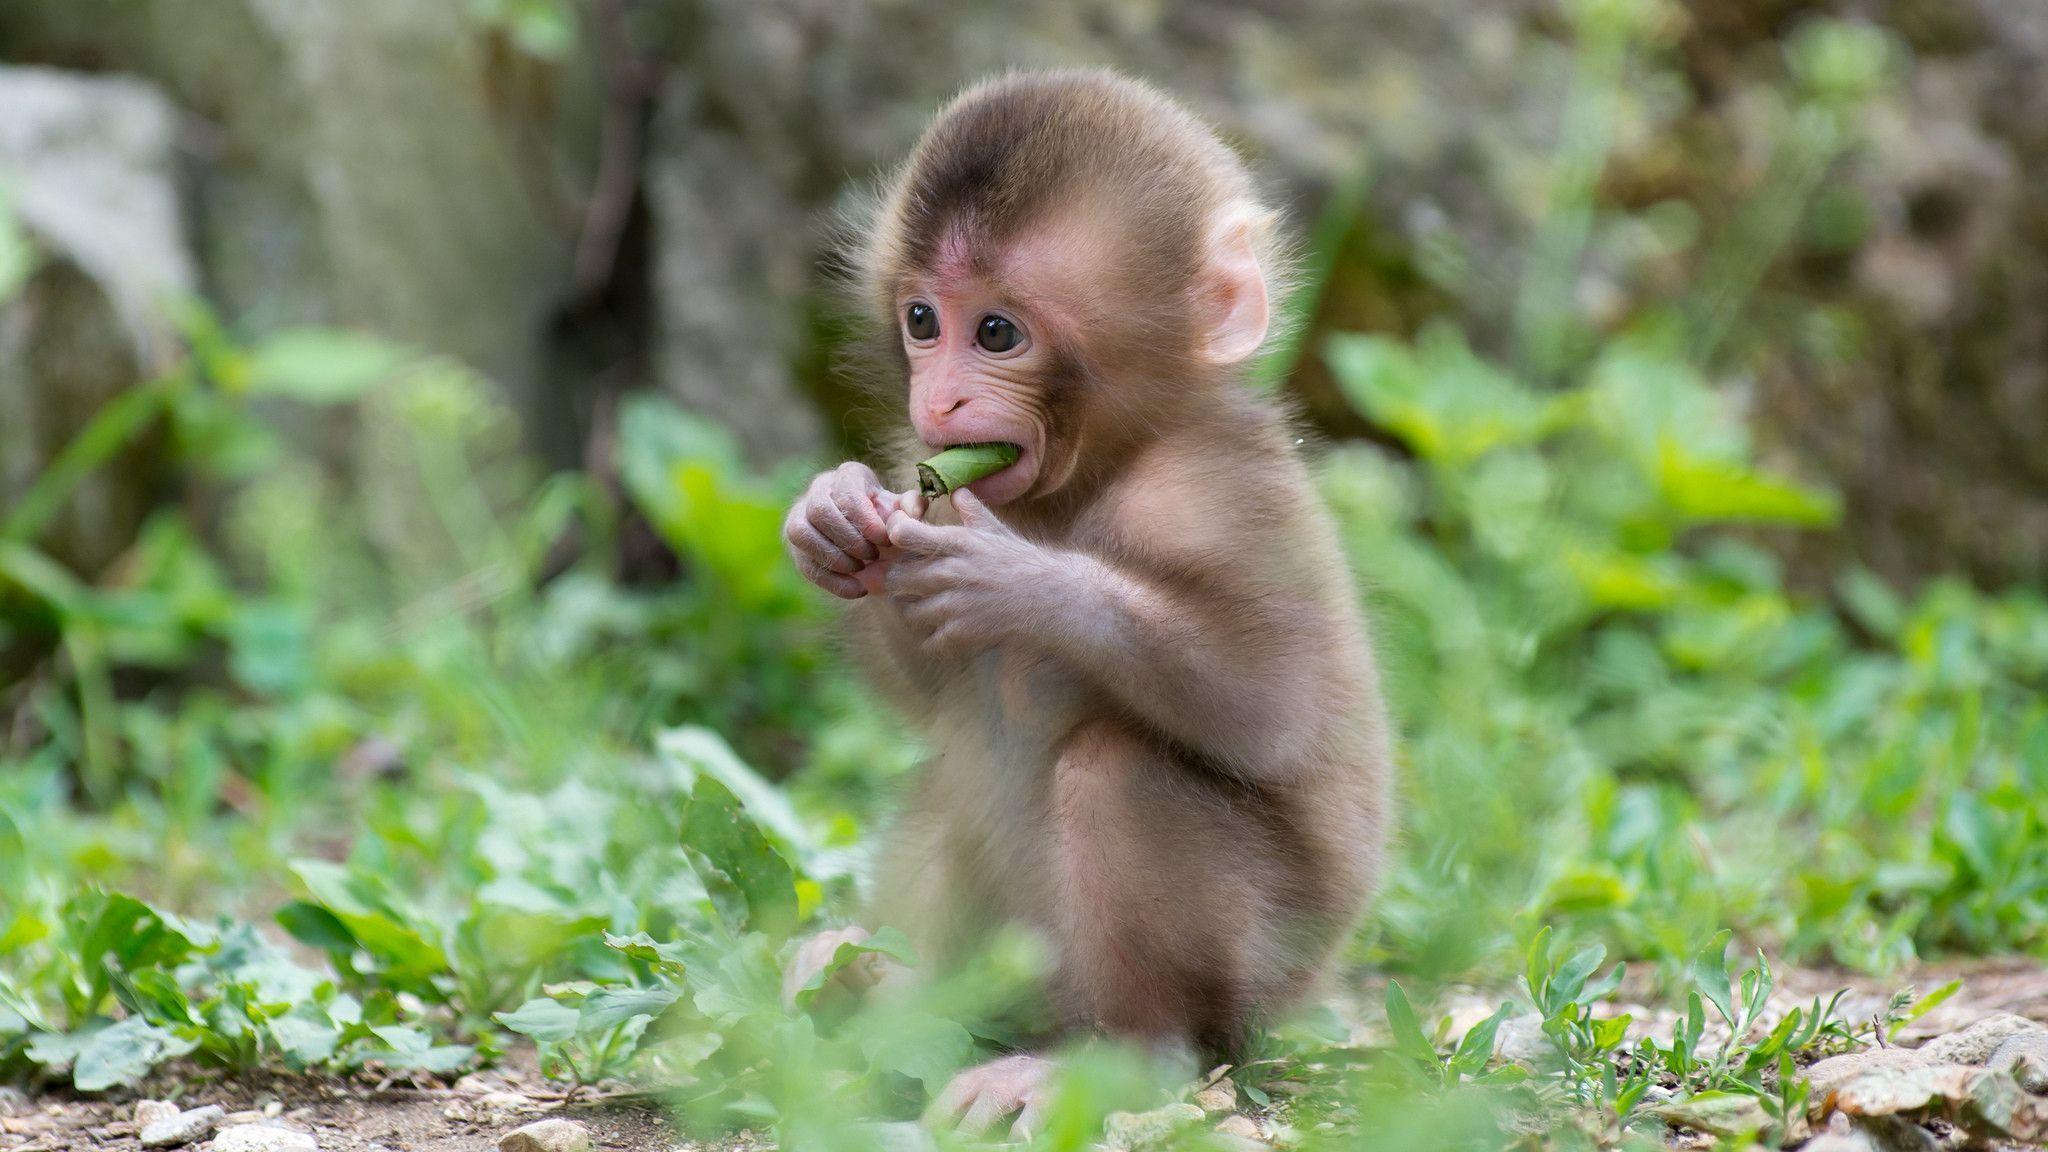 168 Monkey Wallpapers | Monkey Backgrounds